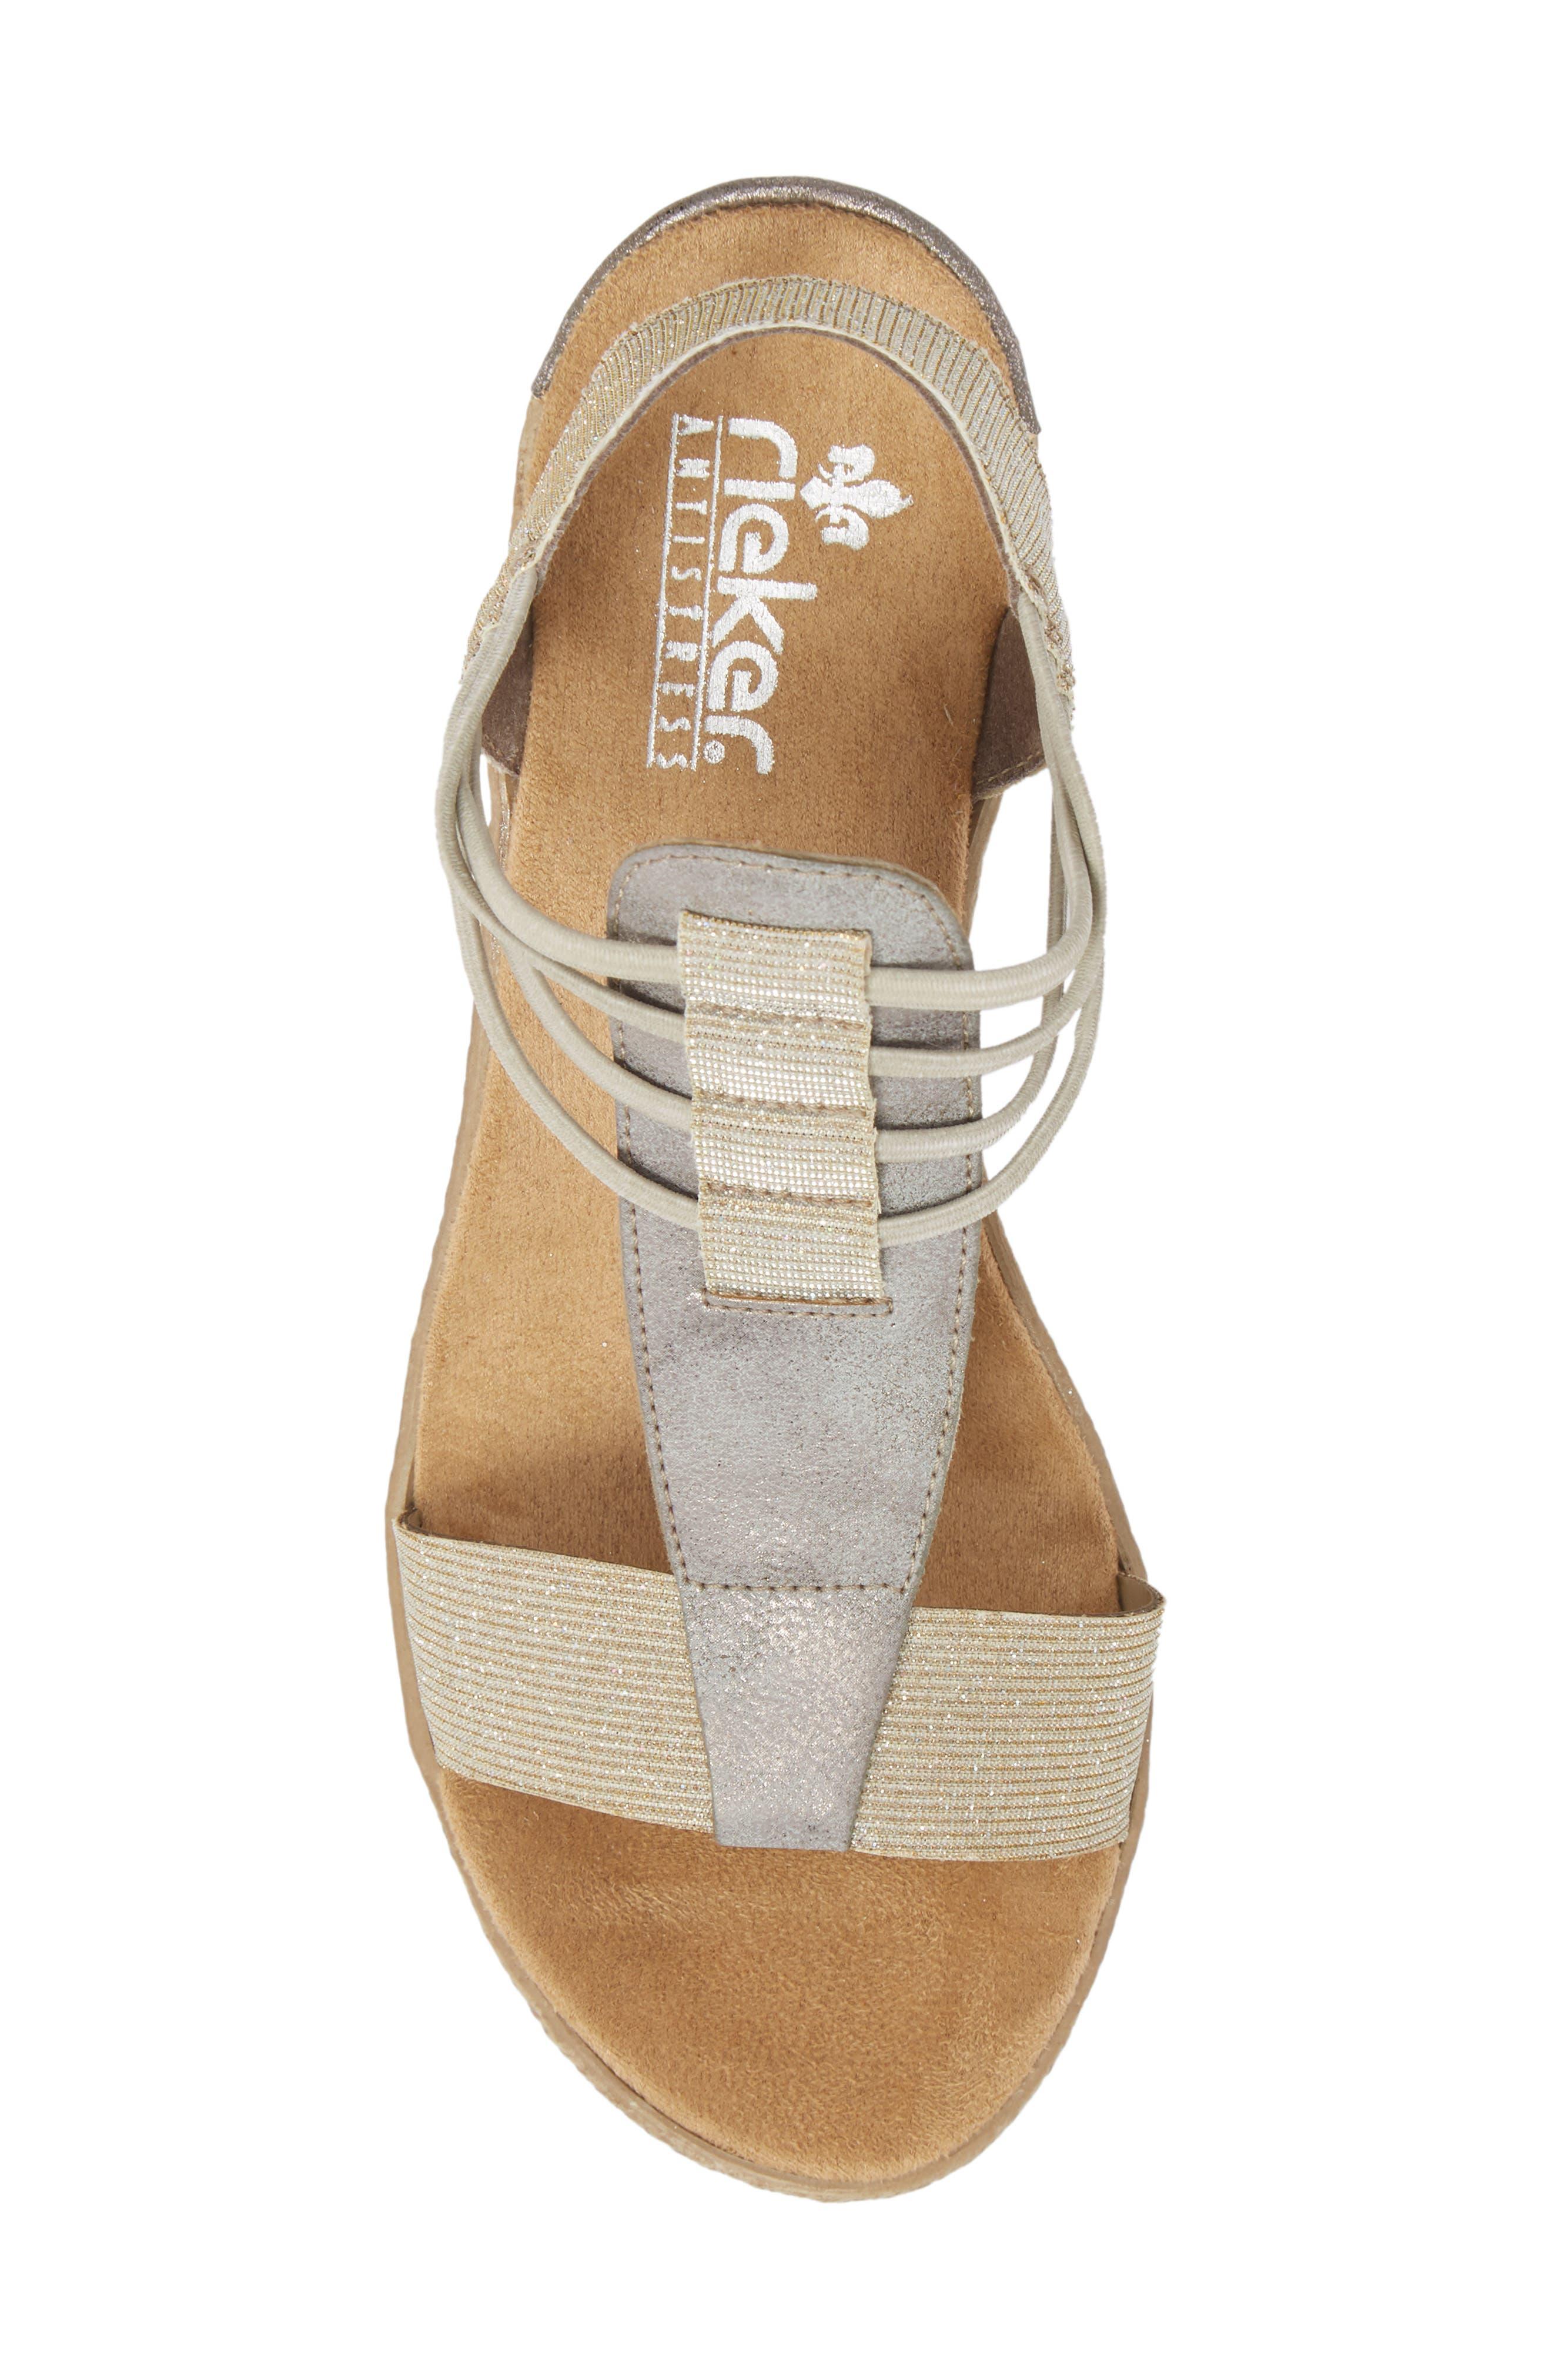 ,                             Fanni 22 Espadrille Wedge Sandal,                             Alternate thumbnail 5, color,                             LIGHT GOLD/ GREY FABRIC